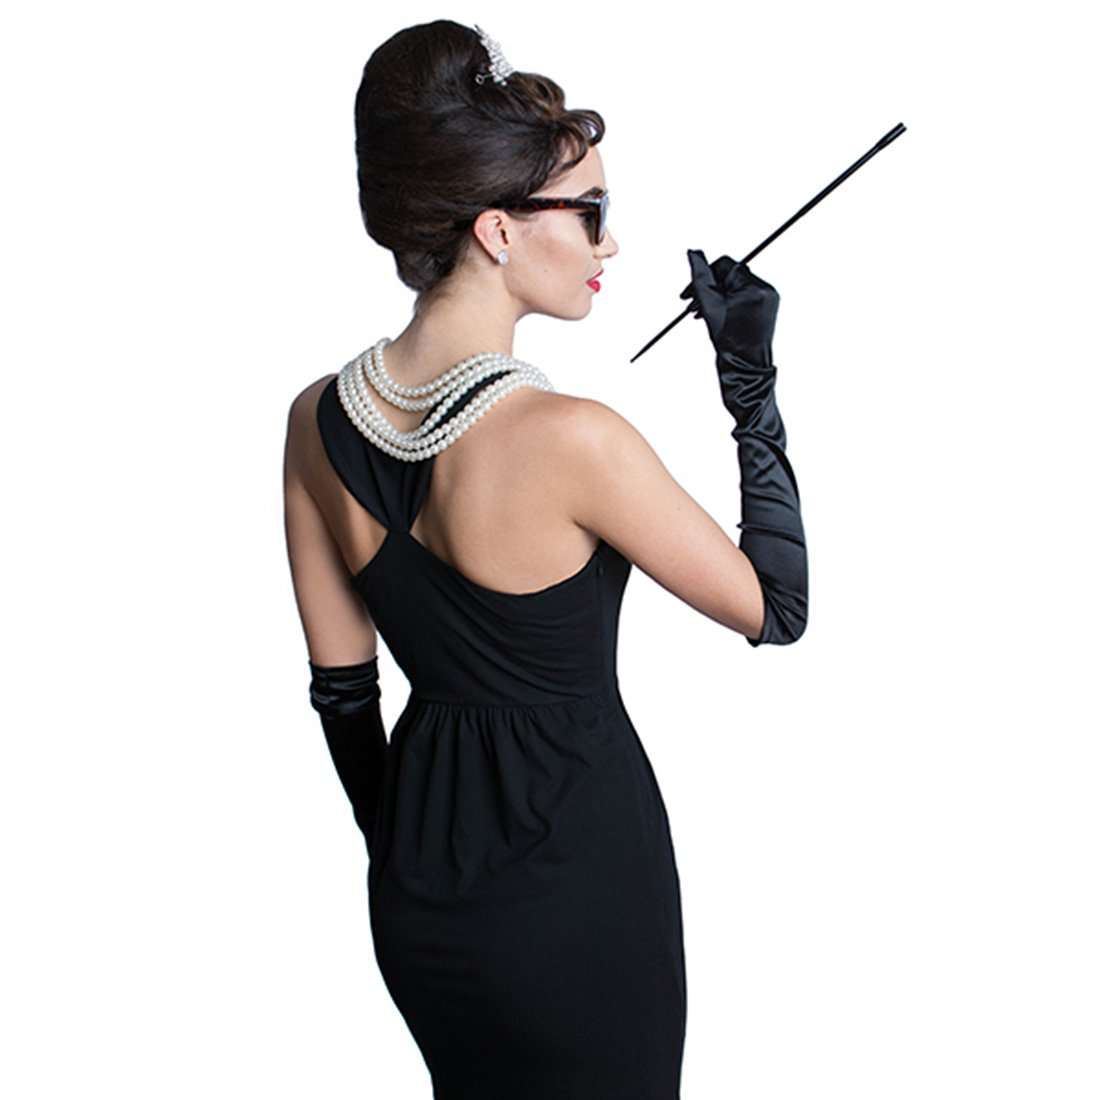 Utopiat Costume Jewelry and Accessory Set, Audrey Hepburn, Breakfast at Tiffany's by Utopiat (Image #4)